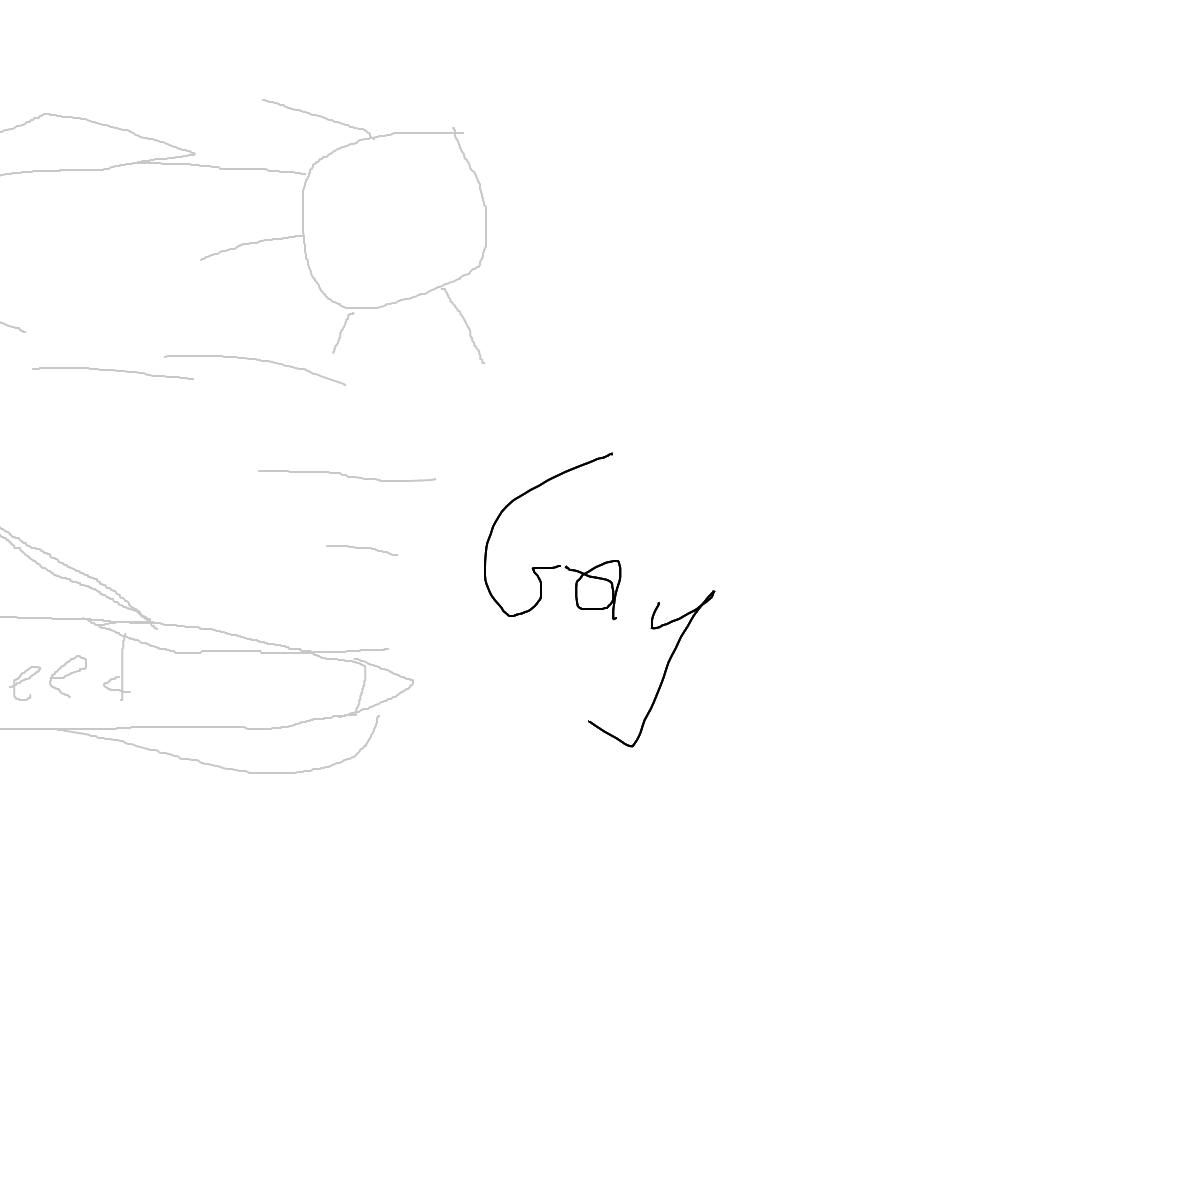 BAAAM drawing#2575 lat:44.2246932983398440lng: -76.4820556640625000